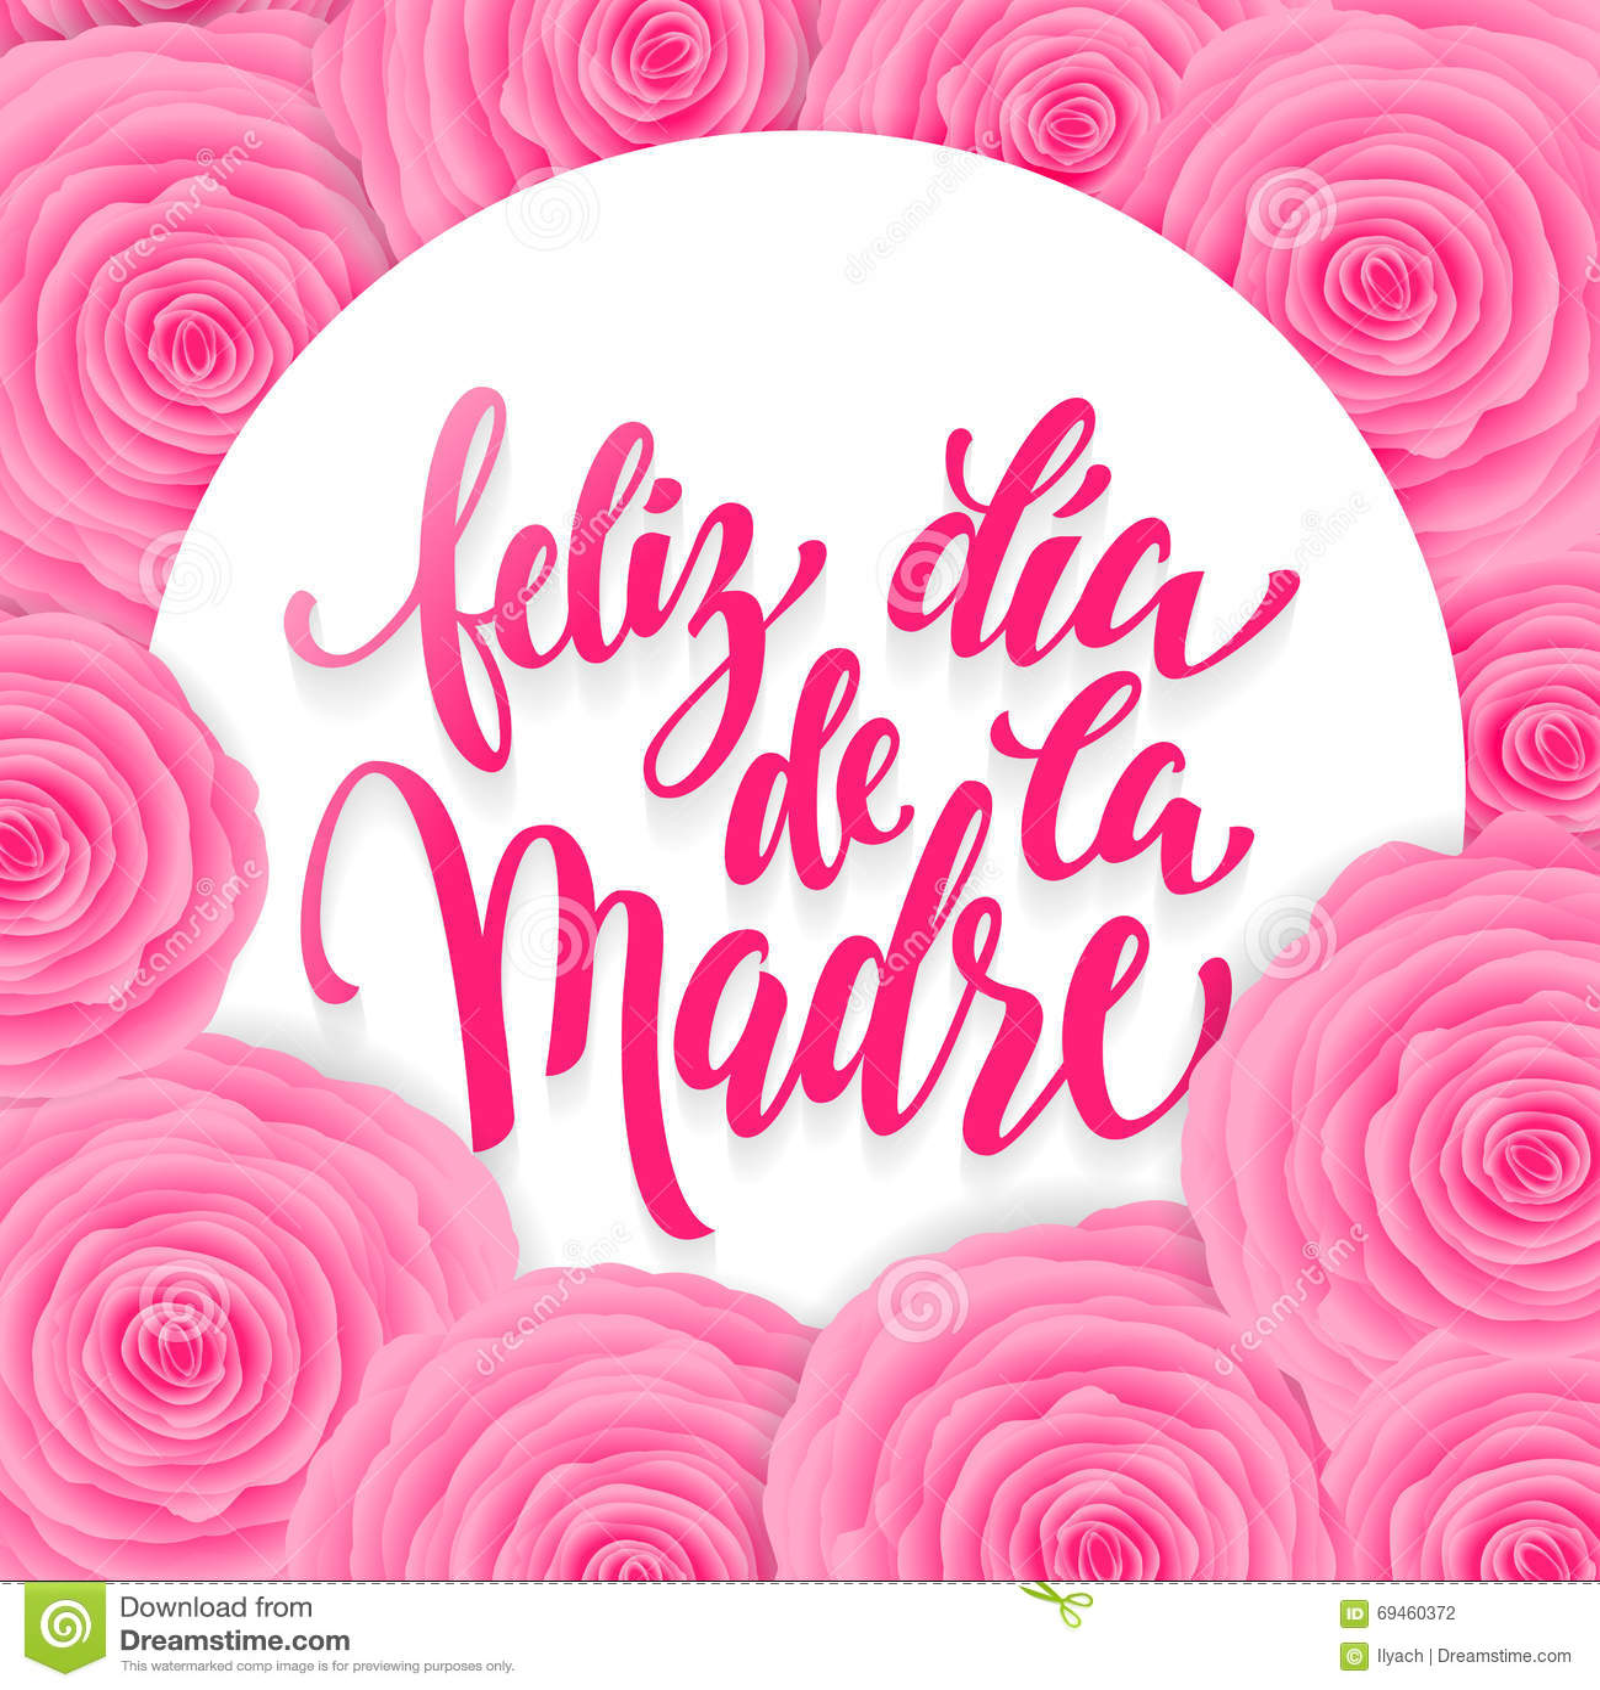 Feliz dia de Madre贺卡 桃红色红色花卉样式